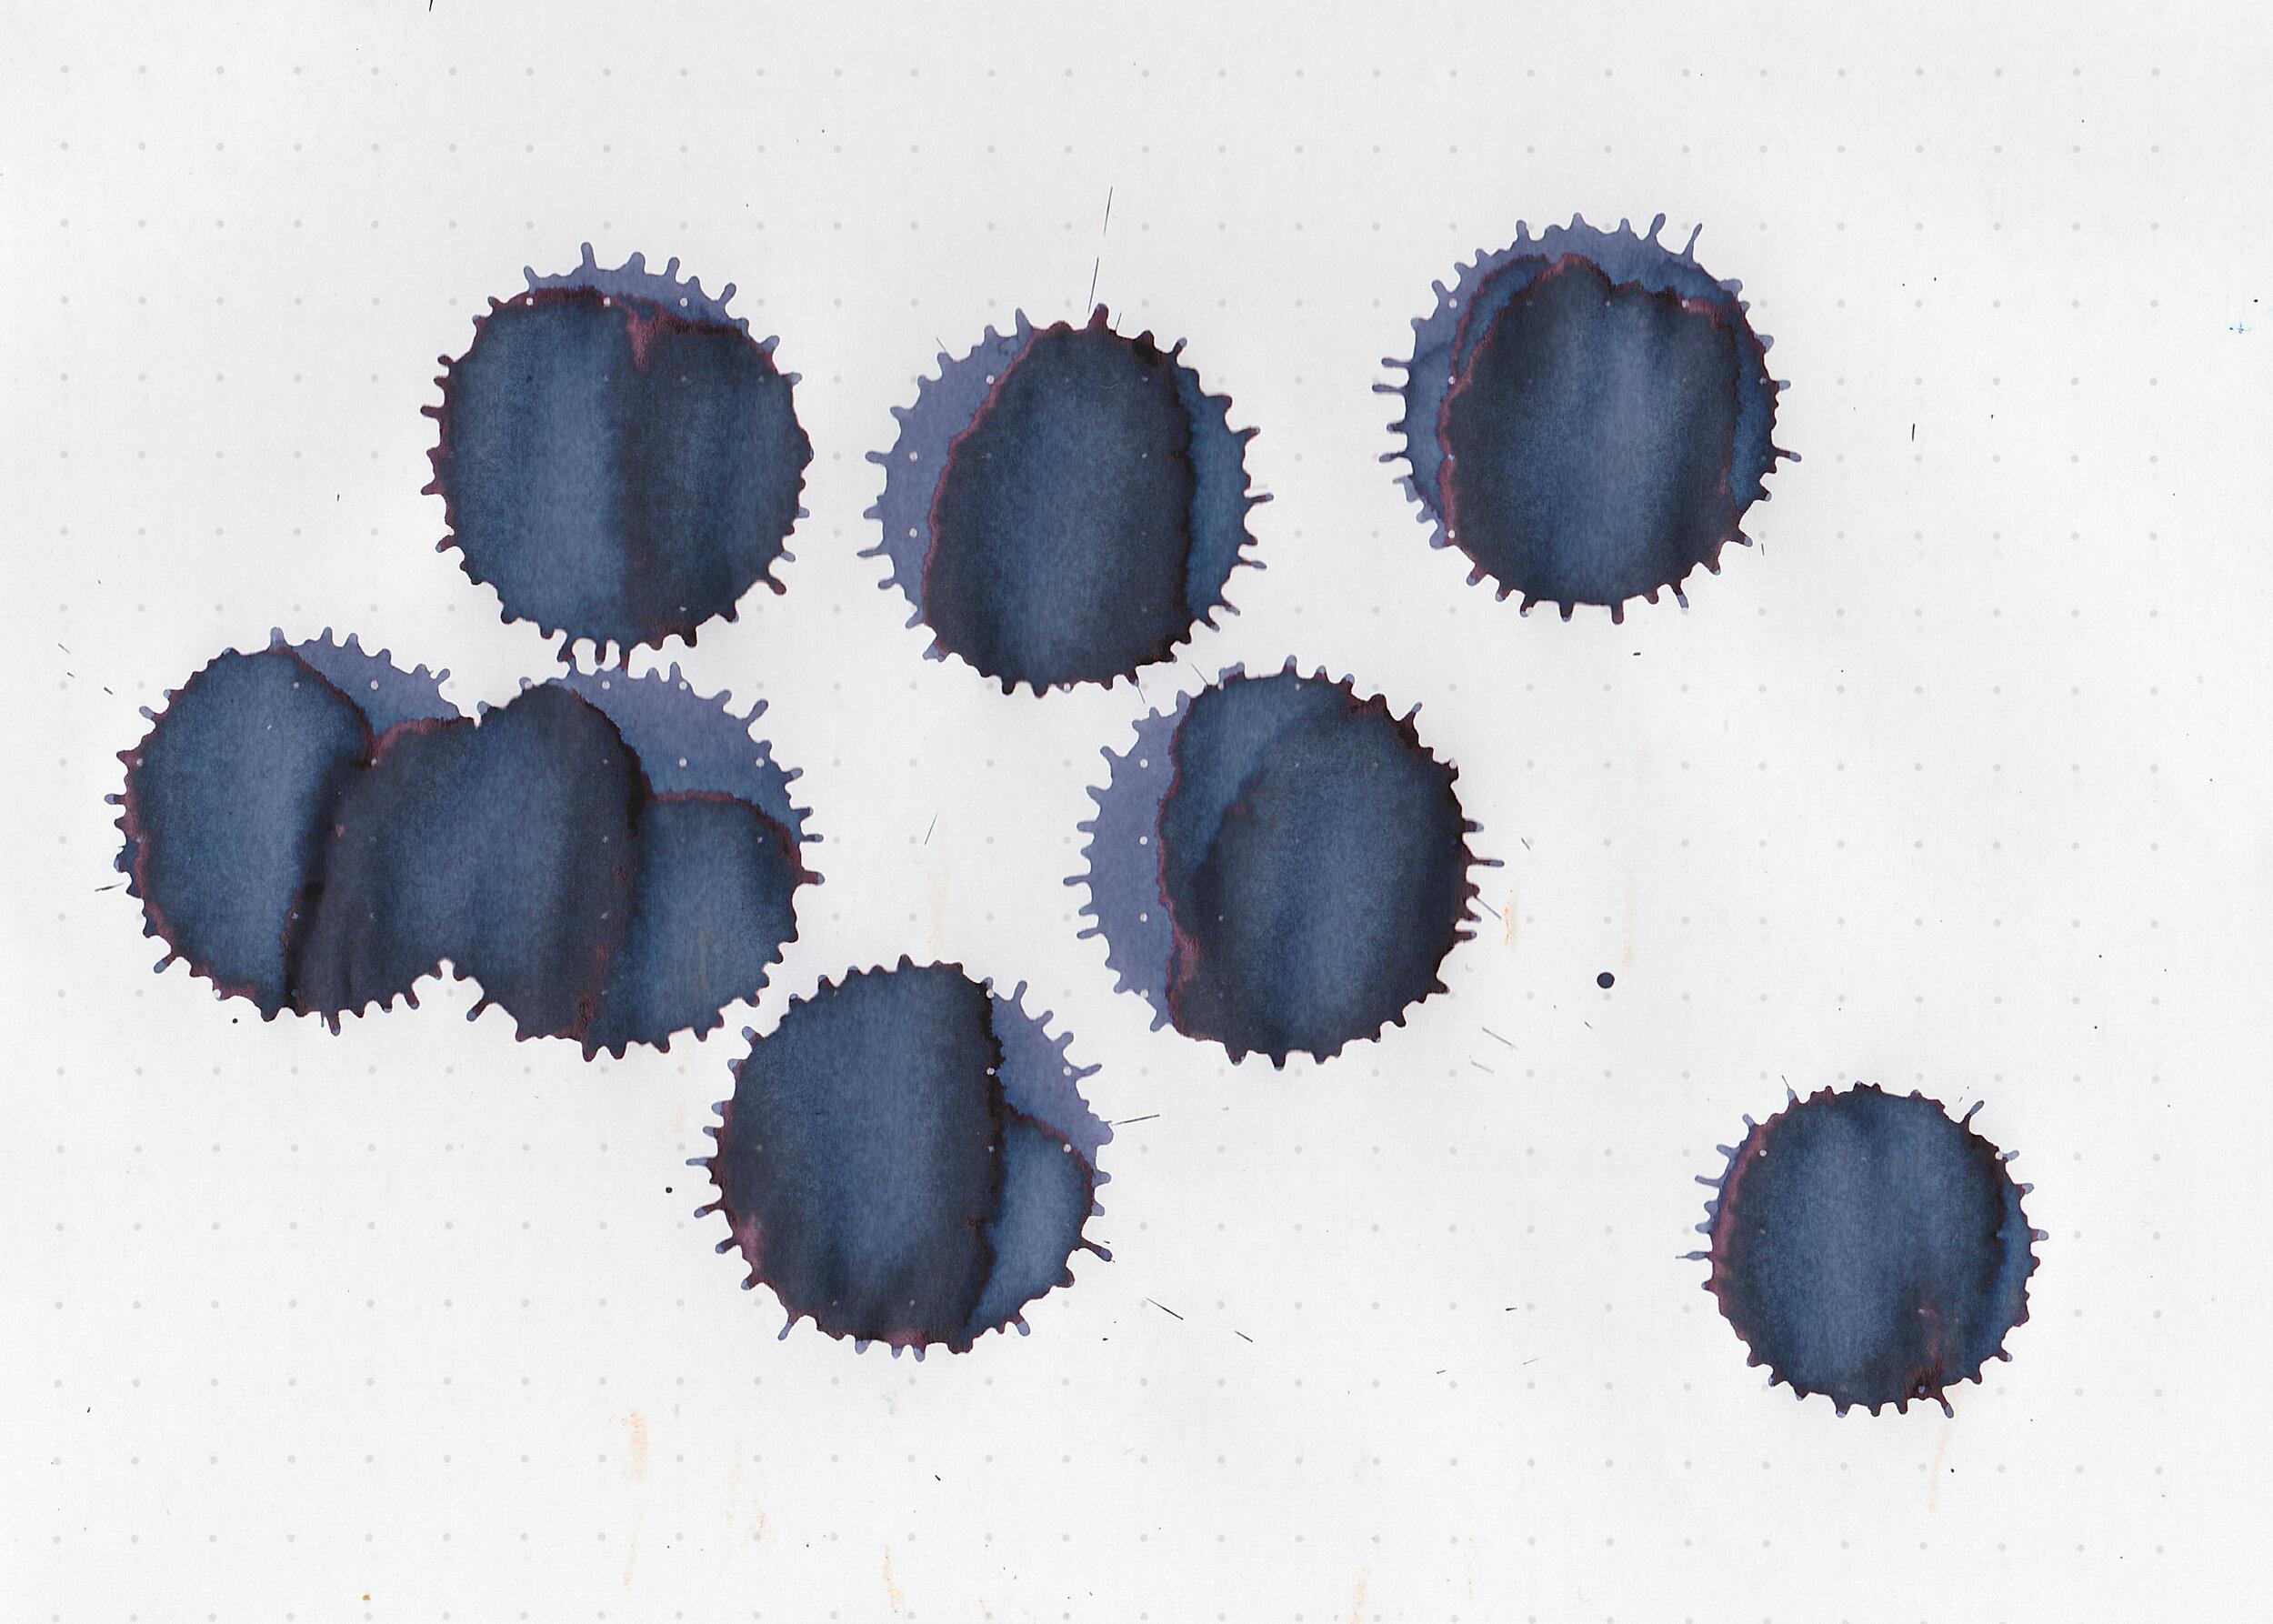 mv-blue-black-7.jpg